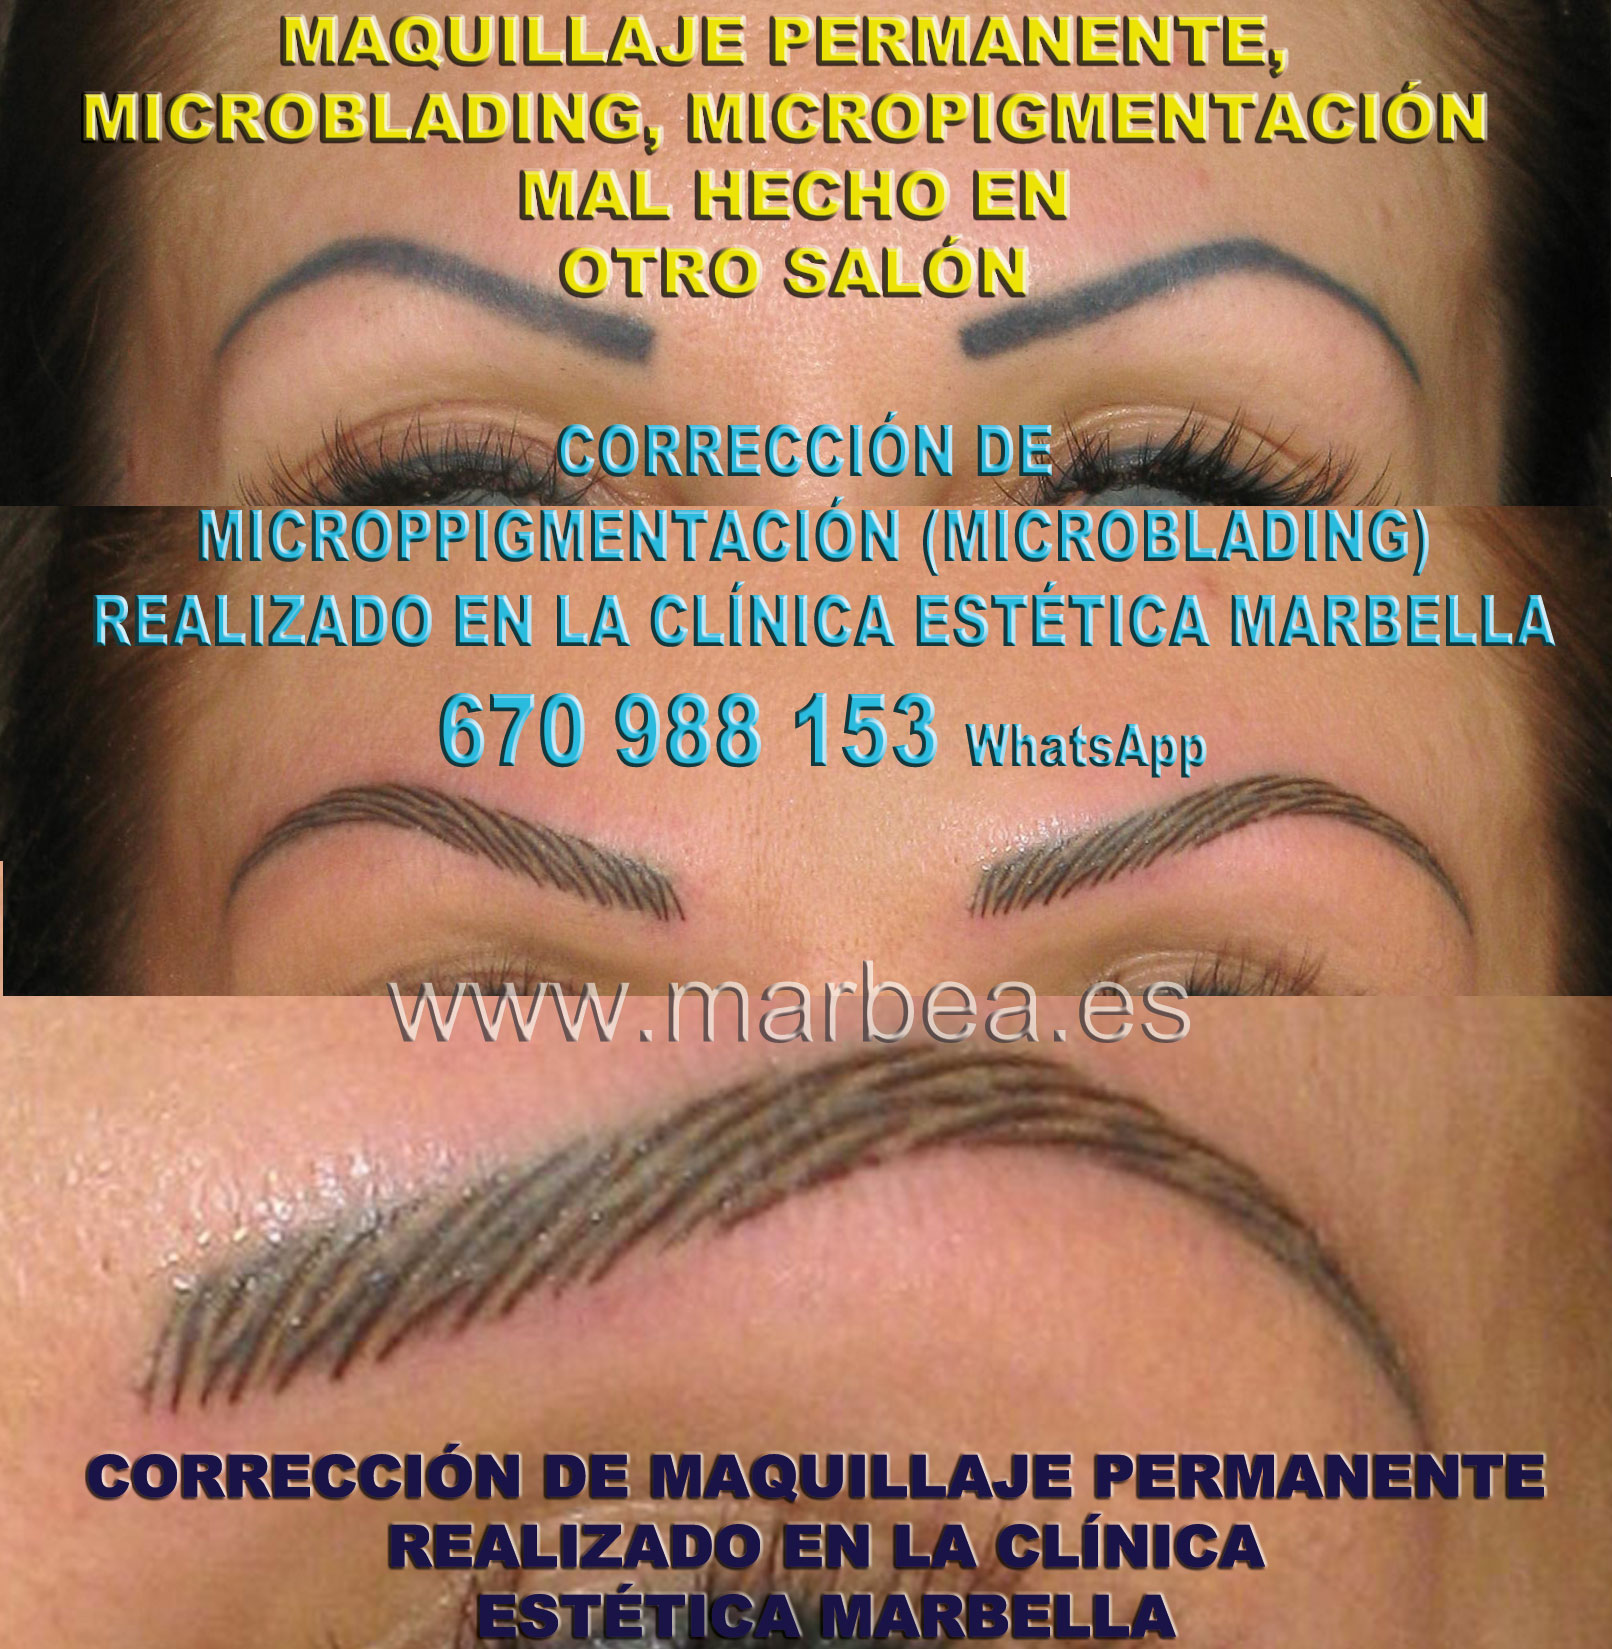 ELIMINAR TATUAJE CEJAS clínica estética maquillaje permanete propone como aclarar la micropigmentación cejas,corregir micropigmentación mal hecha